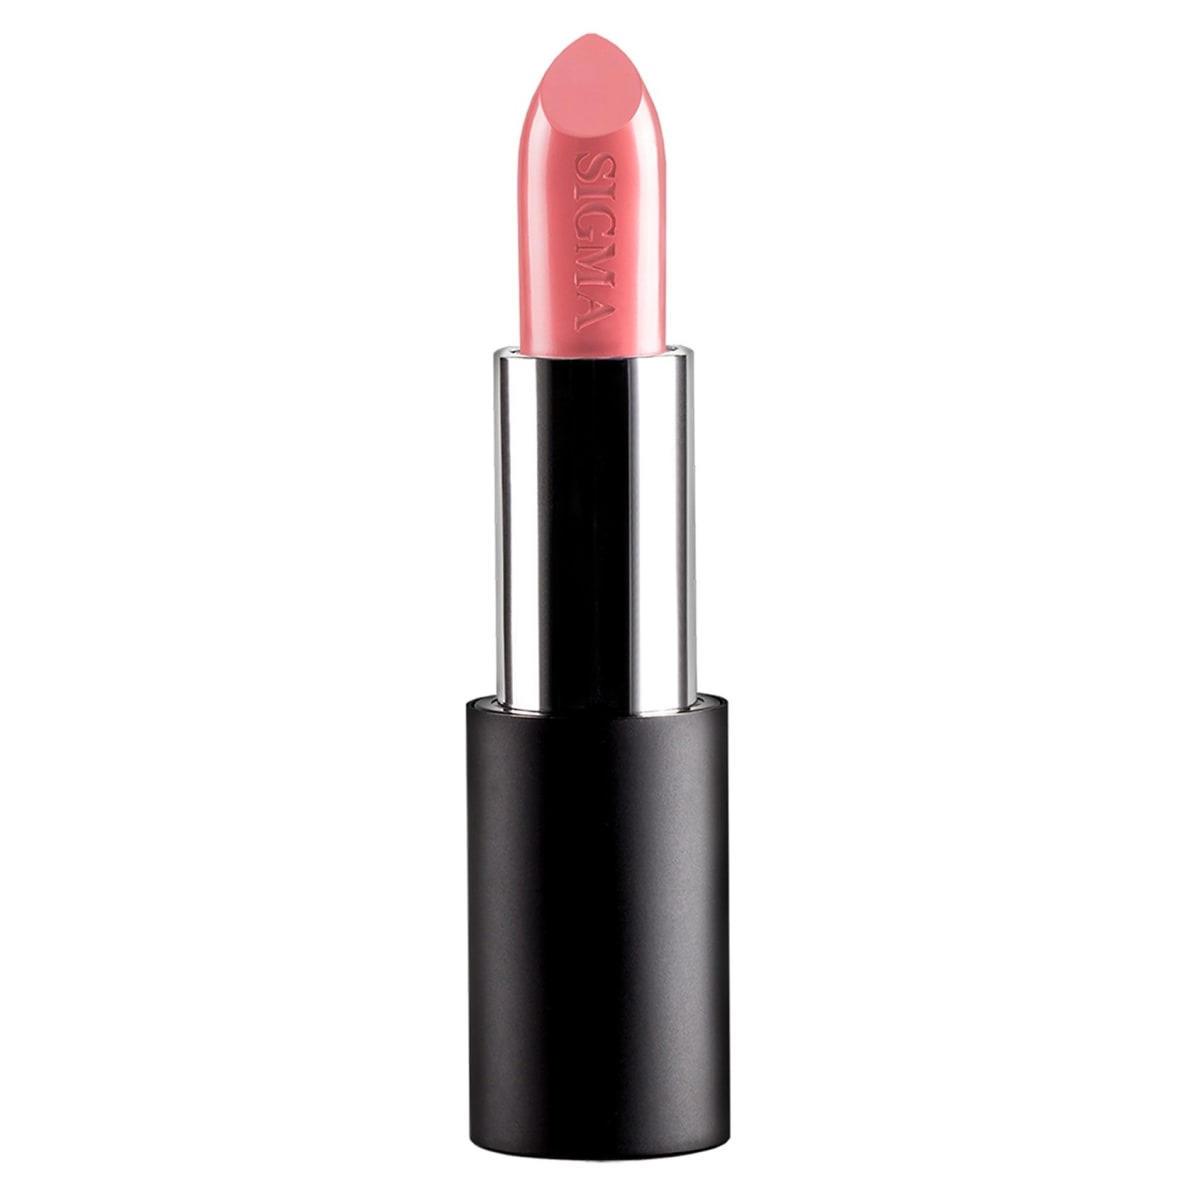 Sigma Power Stick Lipstick In Spades